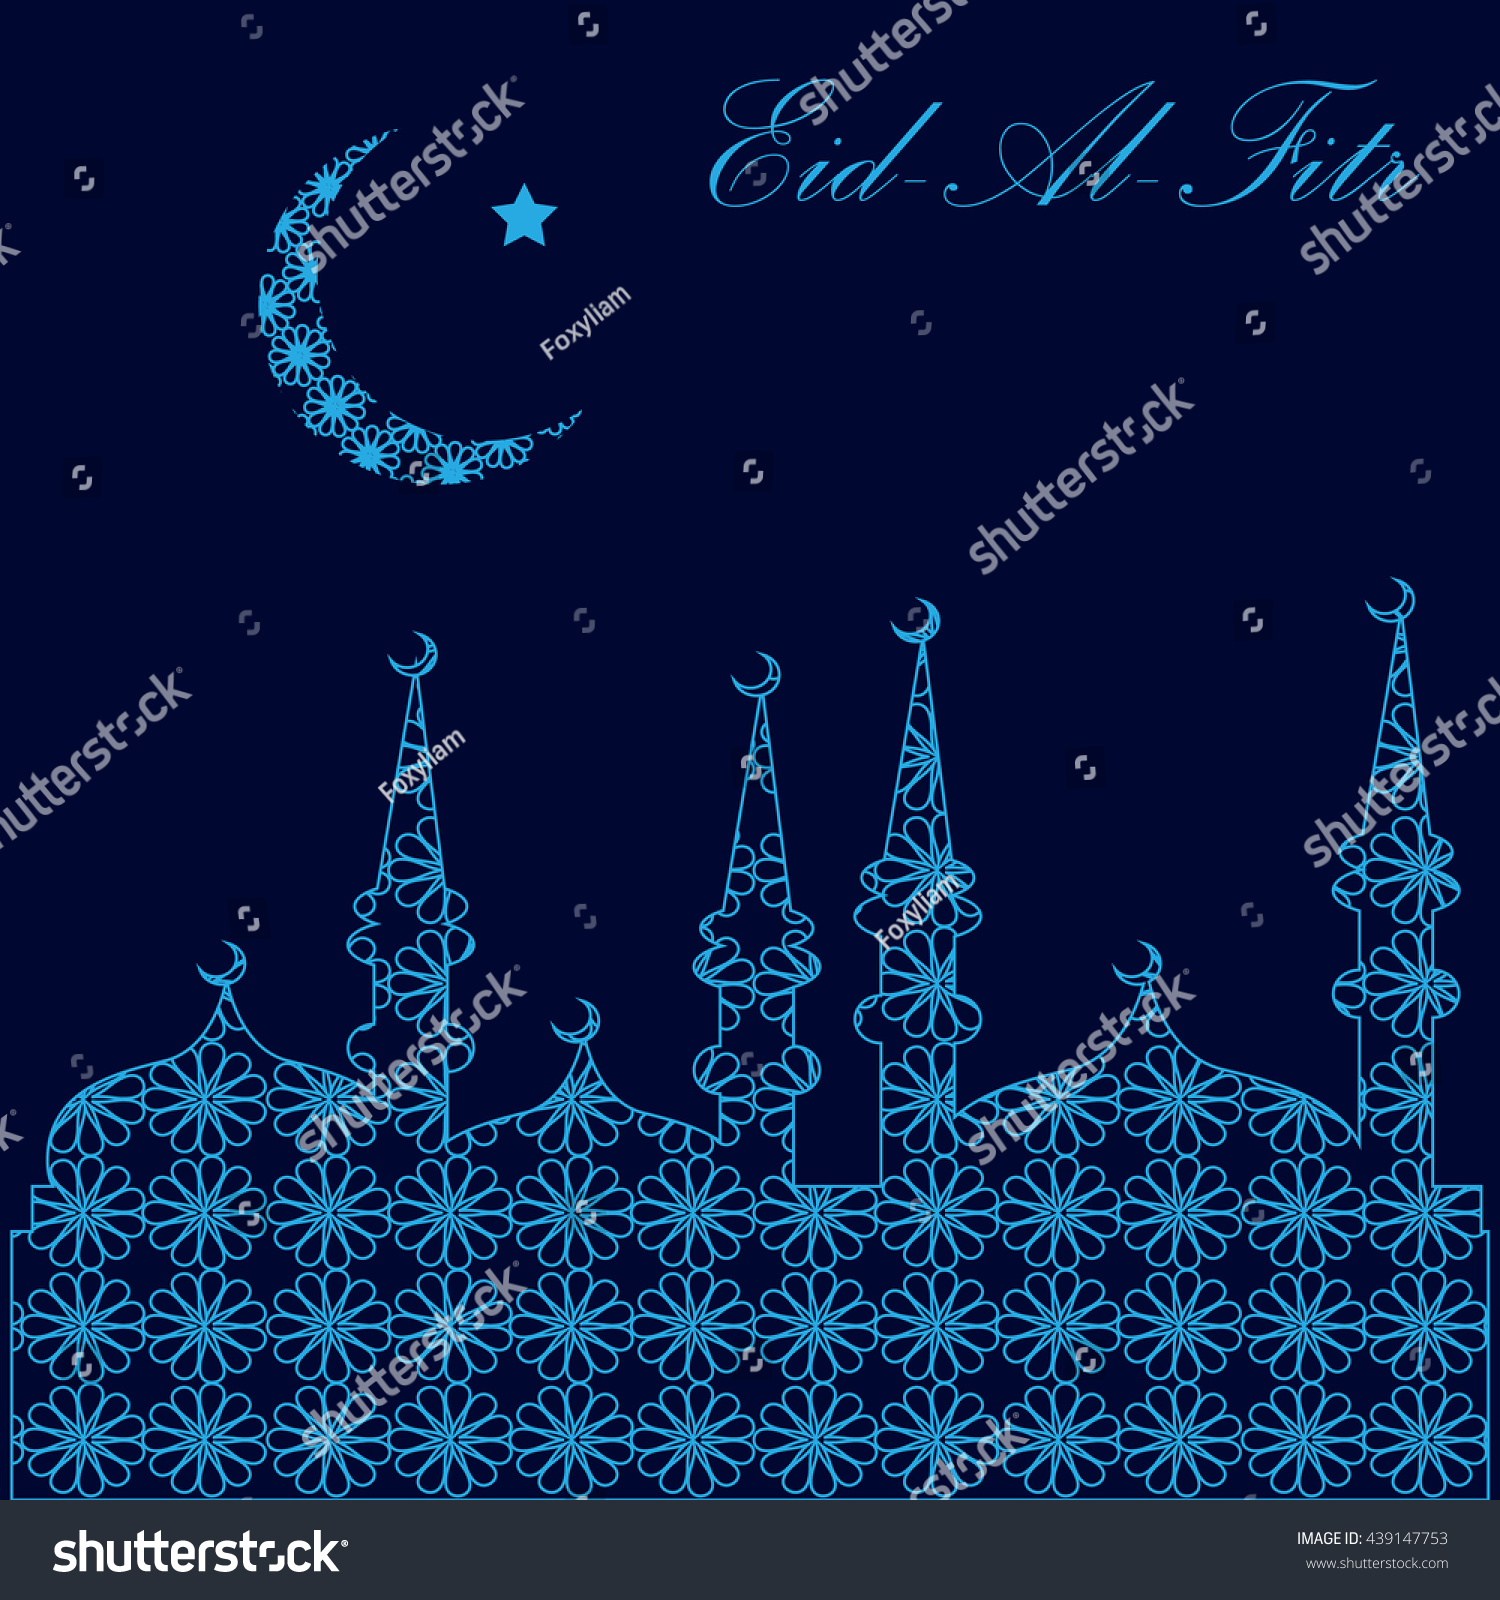 Simple Id Festival Eid Al-Fitr Greeting - stock-vector-muslim-community-festival-eid-al-fitr-eid-mubarak-happy-eid-greeting-background-vector-439147753  Image_835847 .jpg